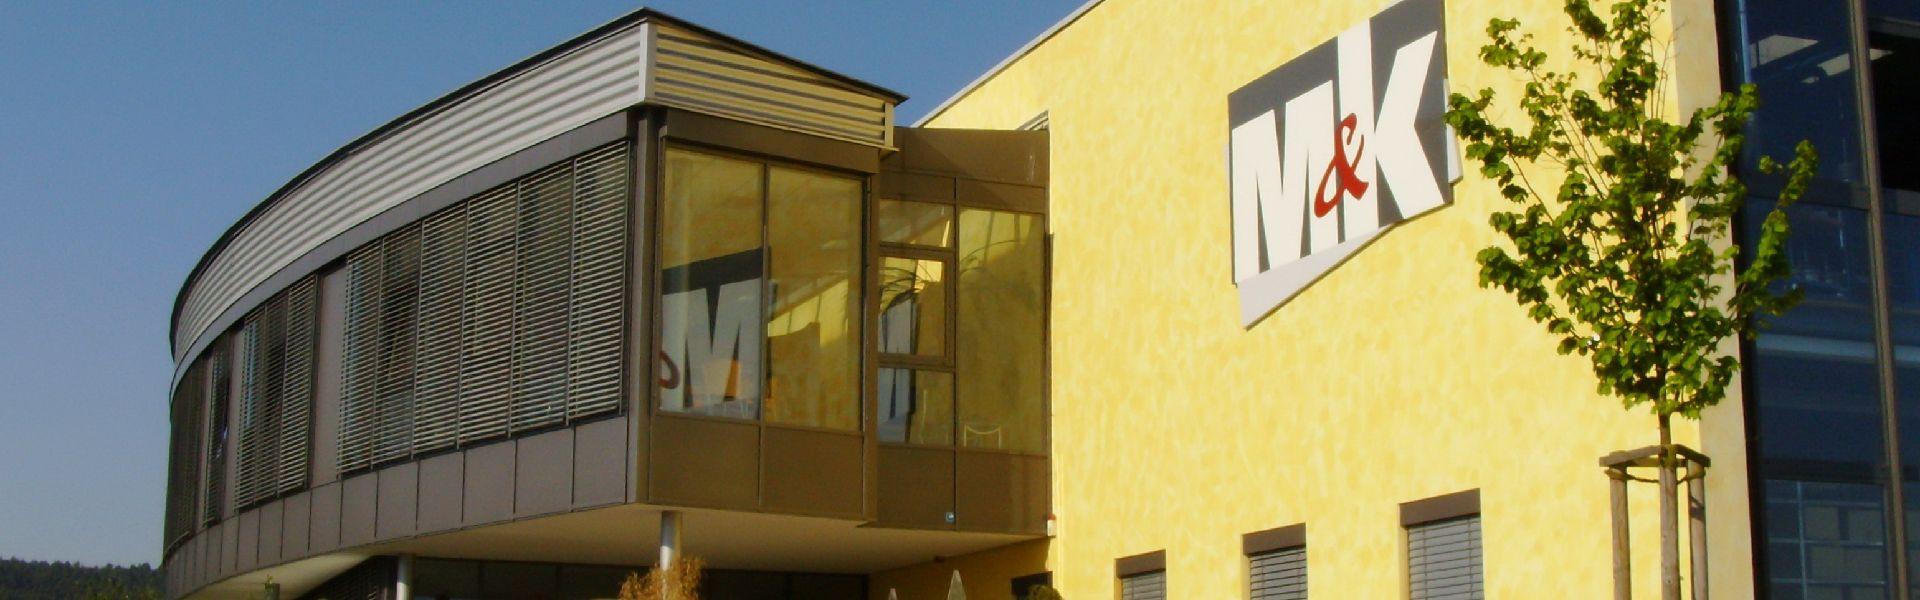 M&K Filze GmbH, Spalt